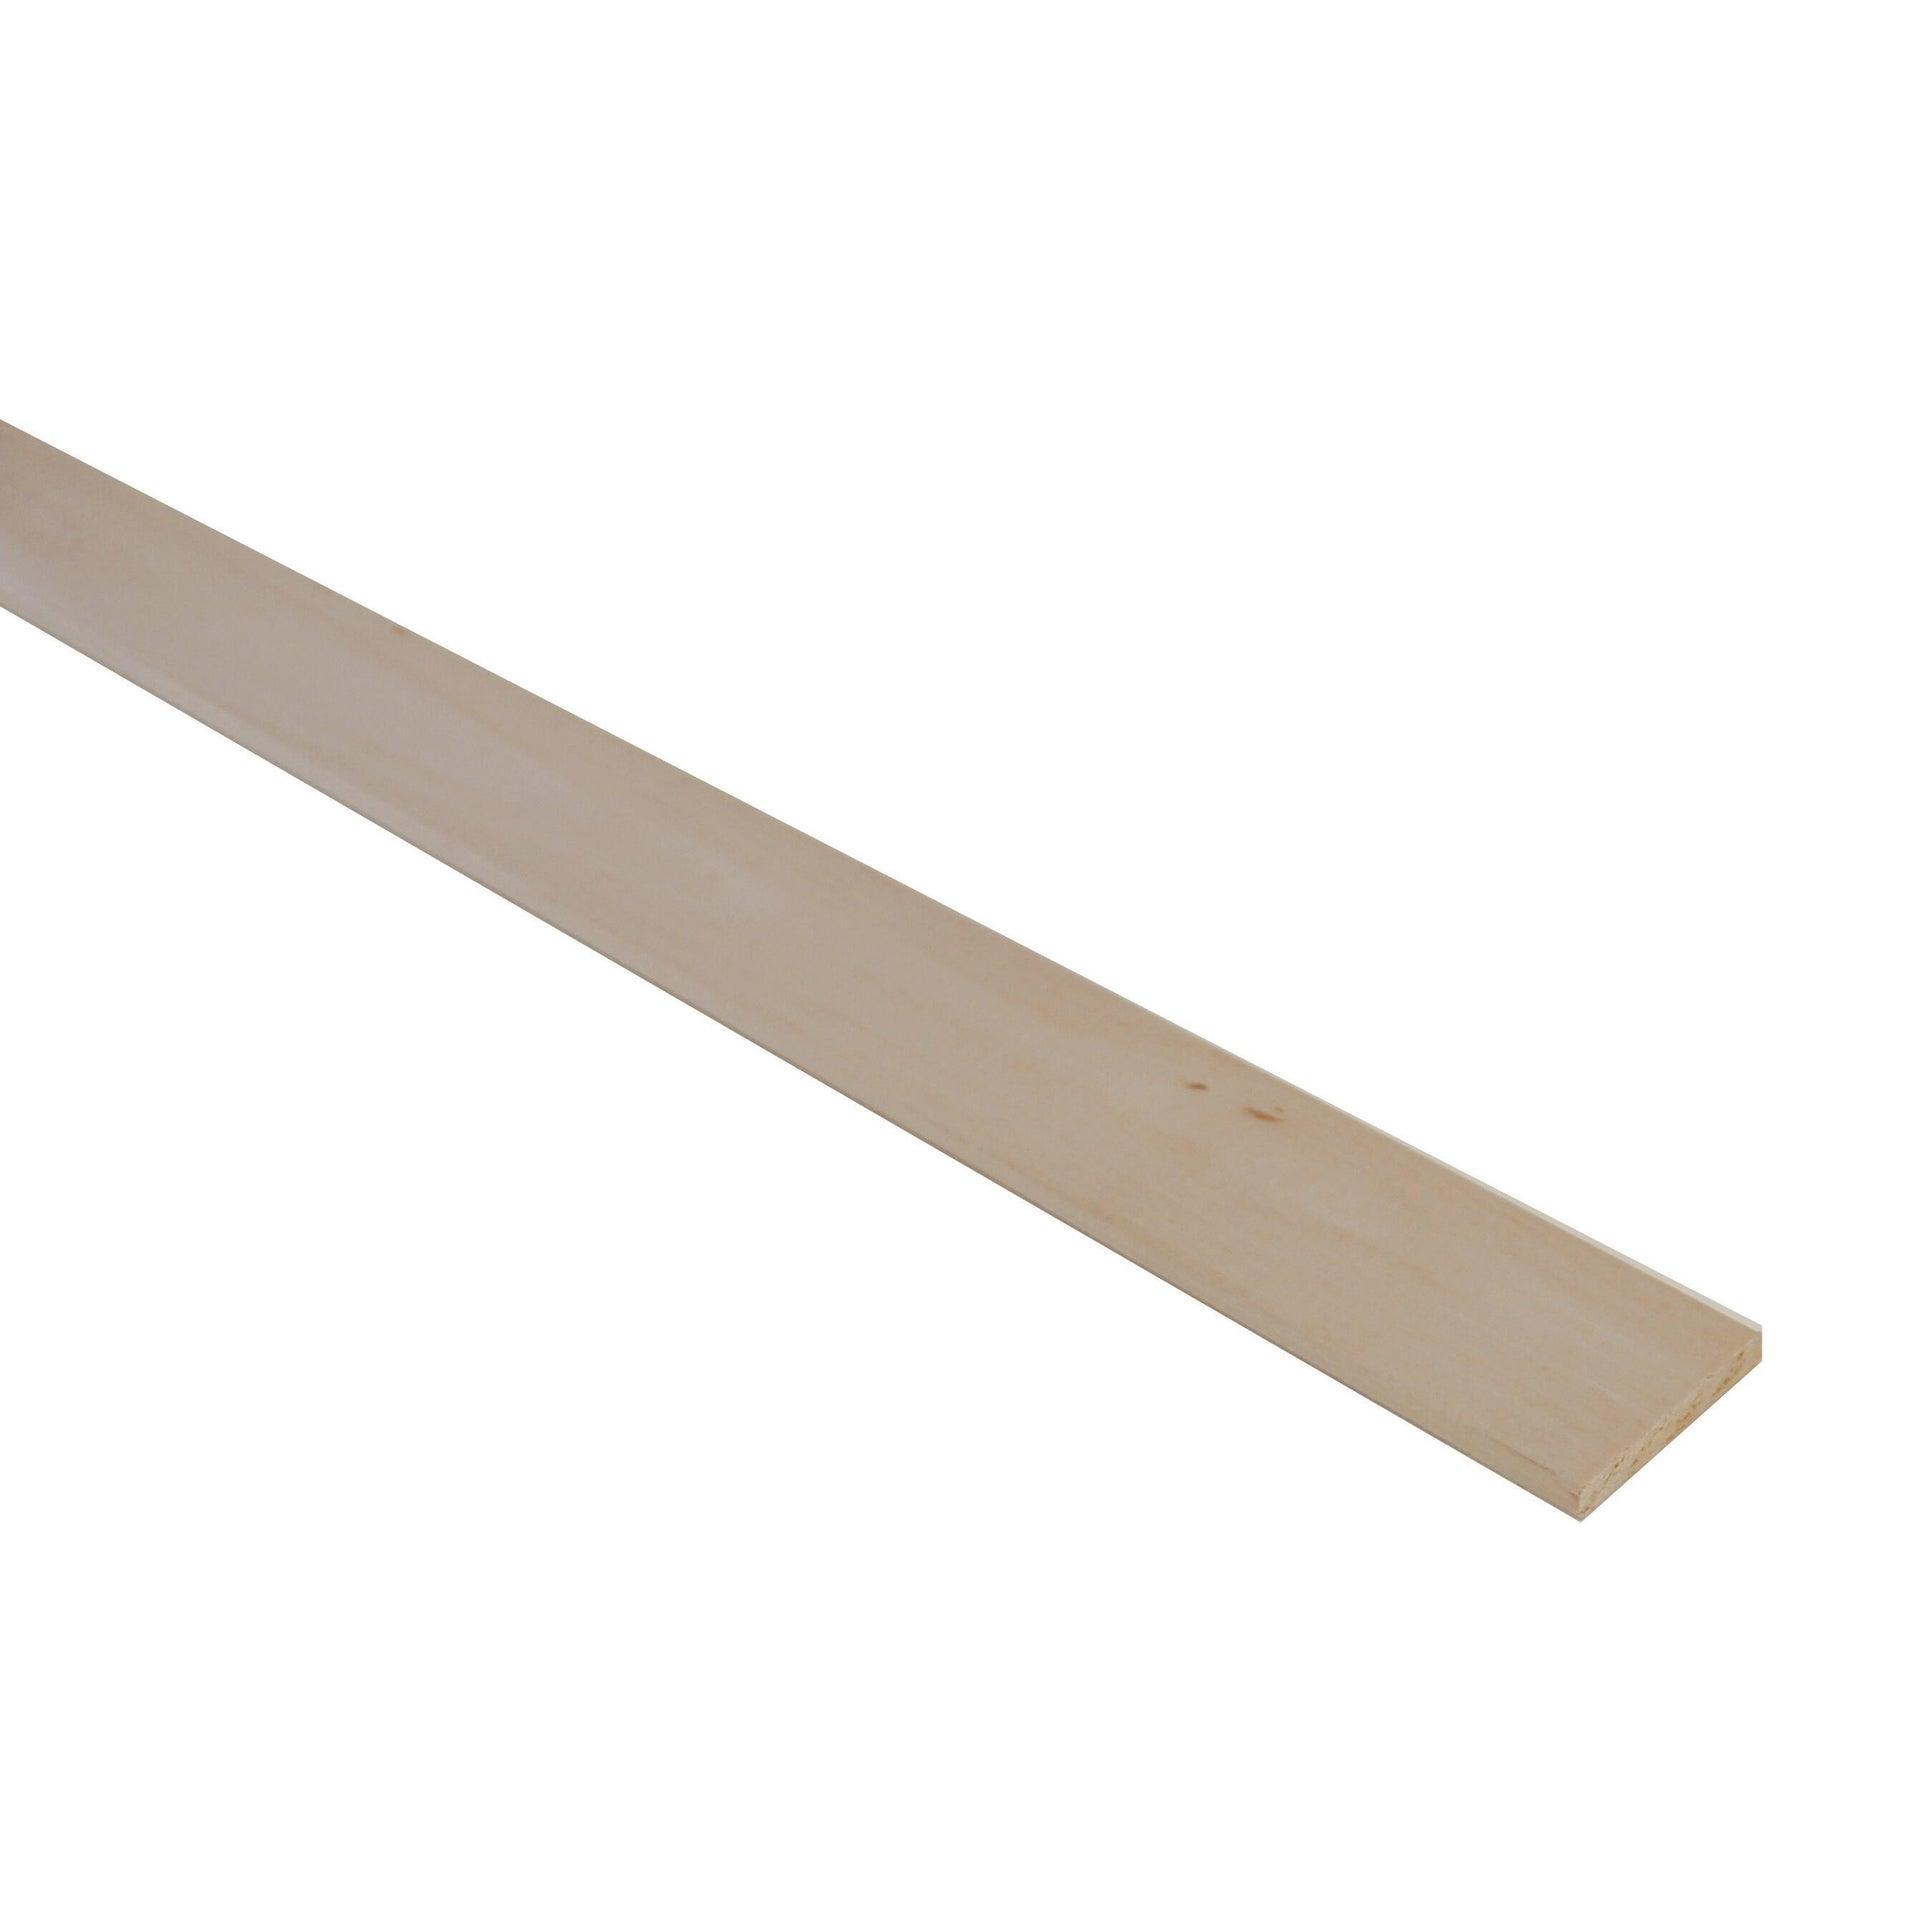 Listello piallato ayous 1 m x 40 mm, Sp 5 mm